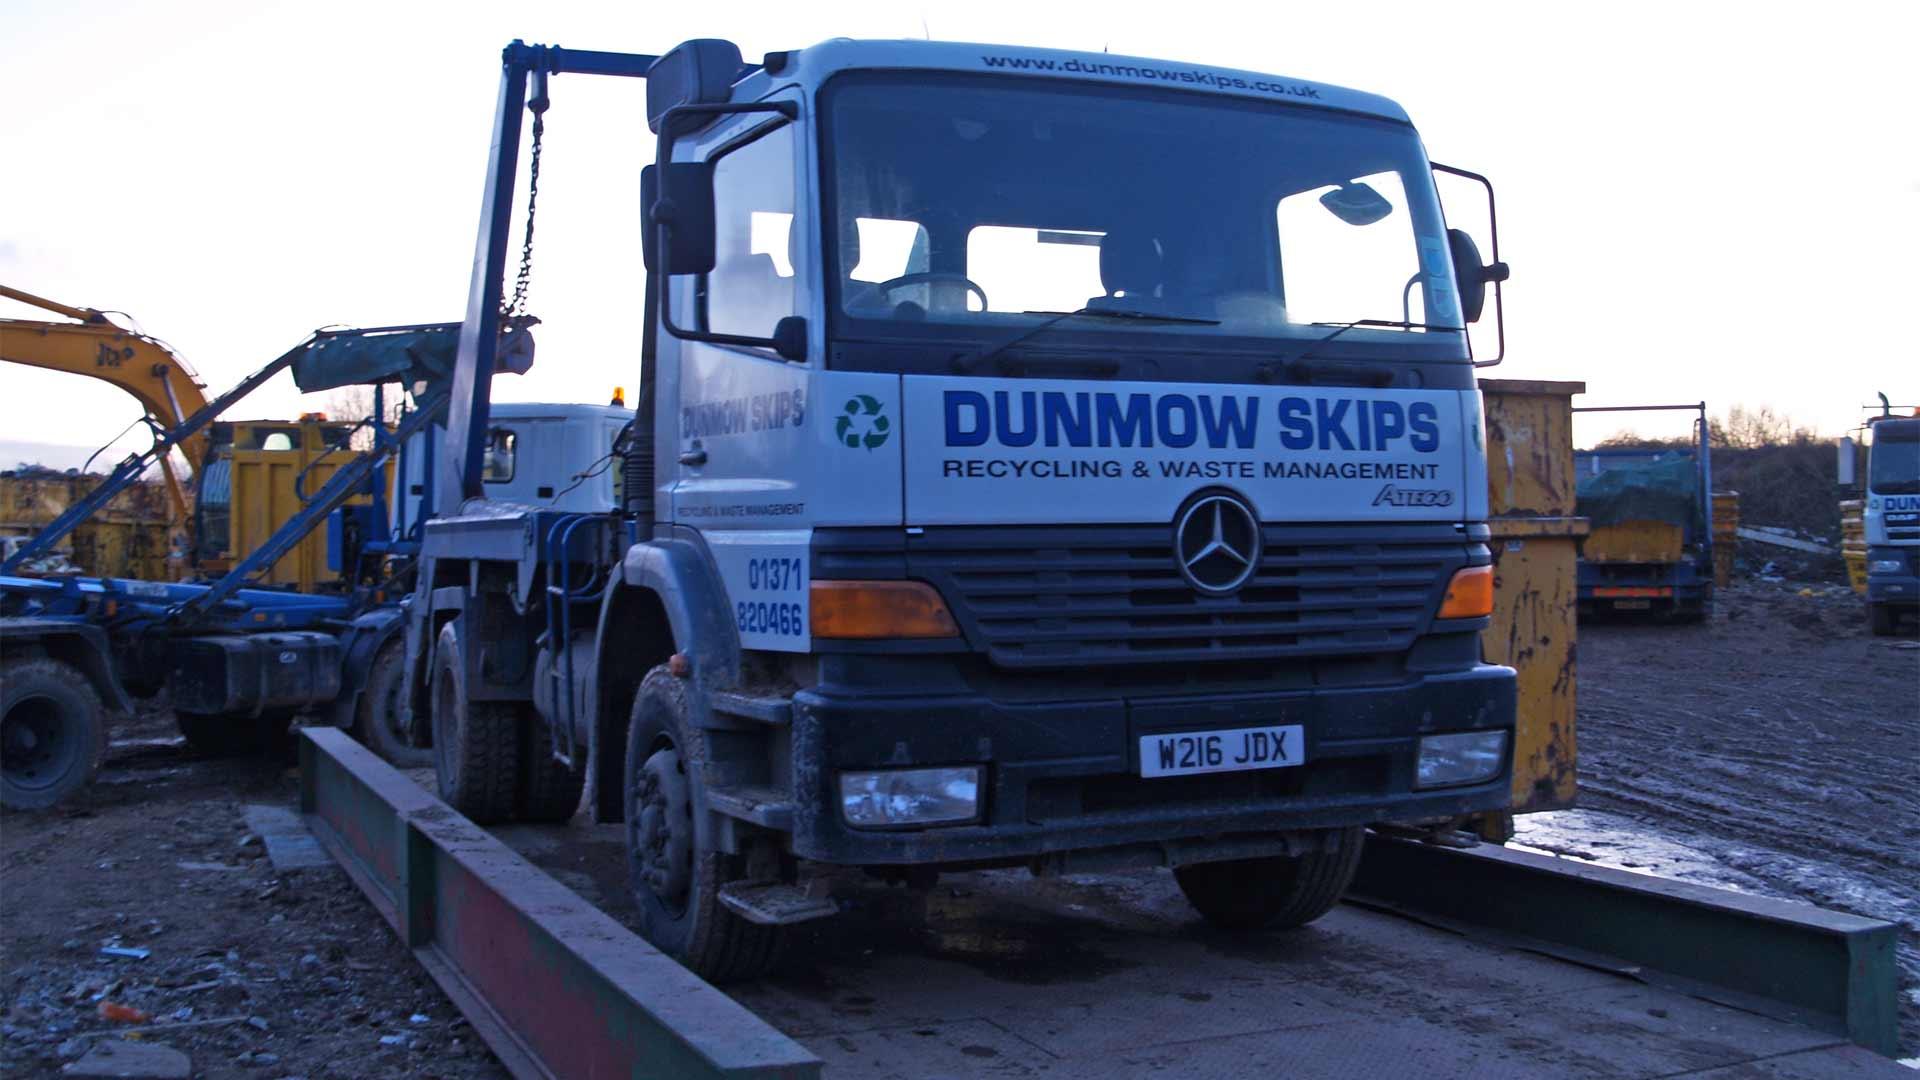 39-Dunmow-Skip-Hire-History